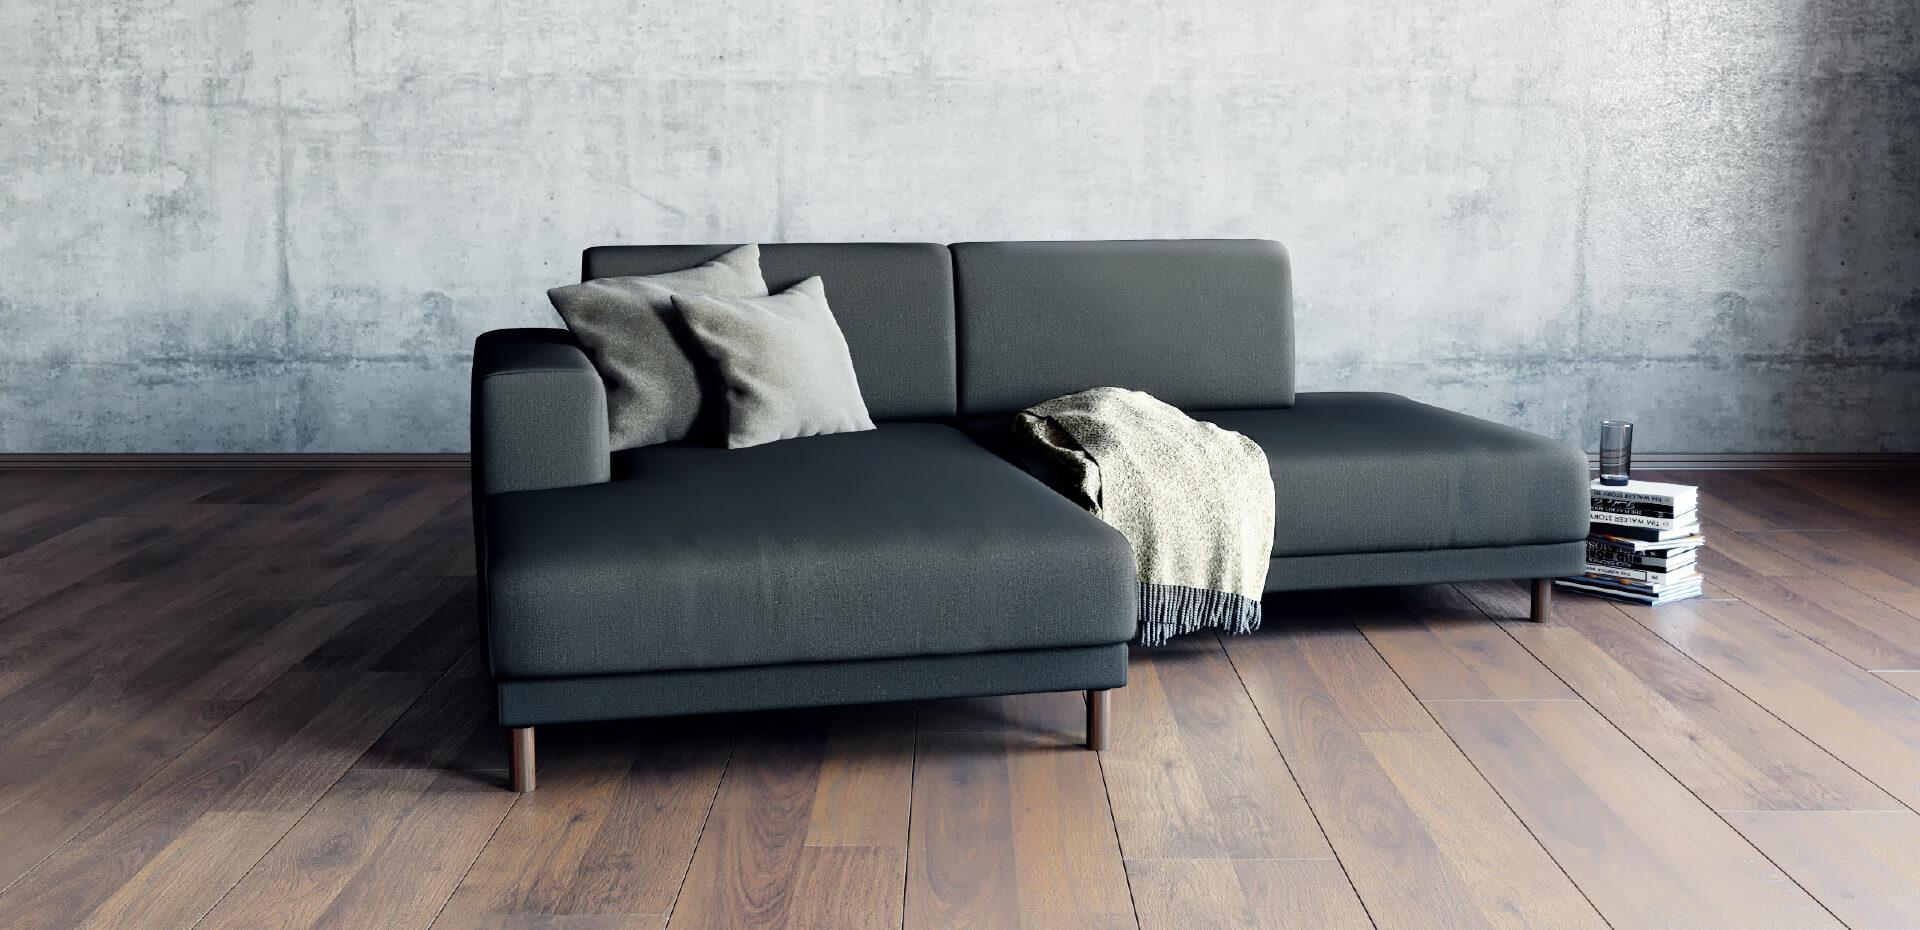 ecksofa selbst gestalten sofas bei mycs mycs schweiz. Black Bedroom Furniture Sets. Home Design Ideas